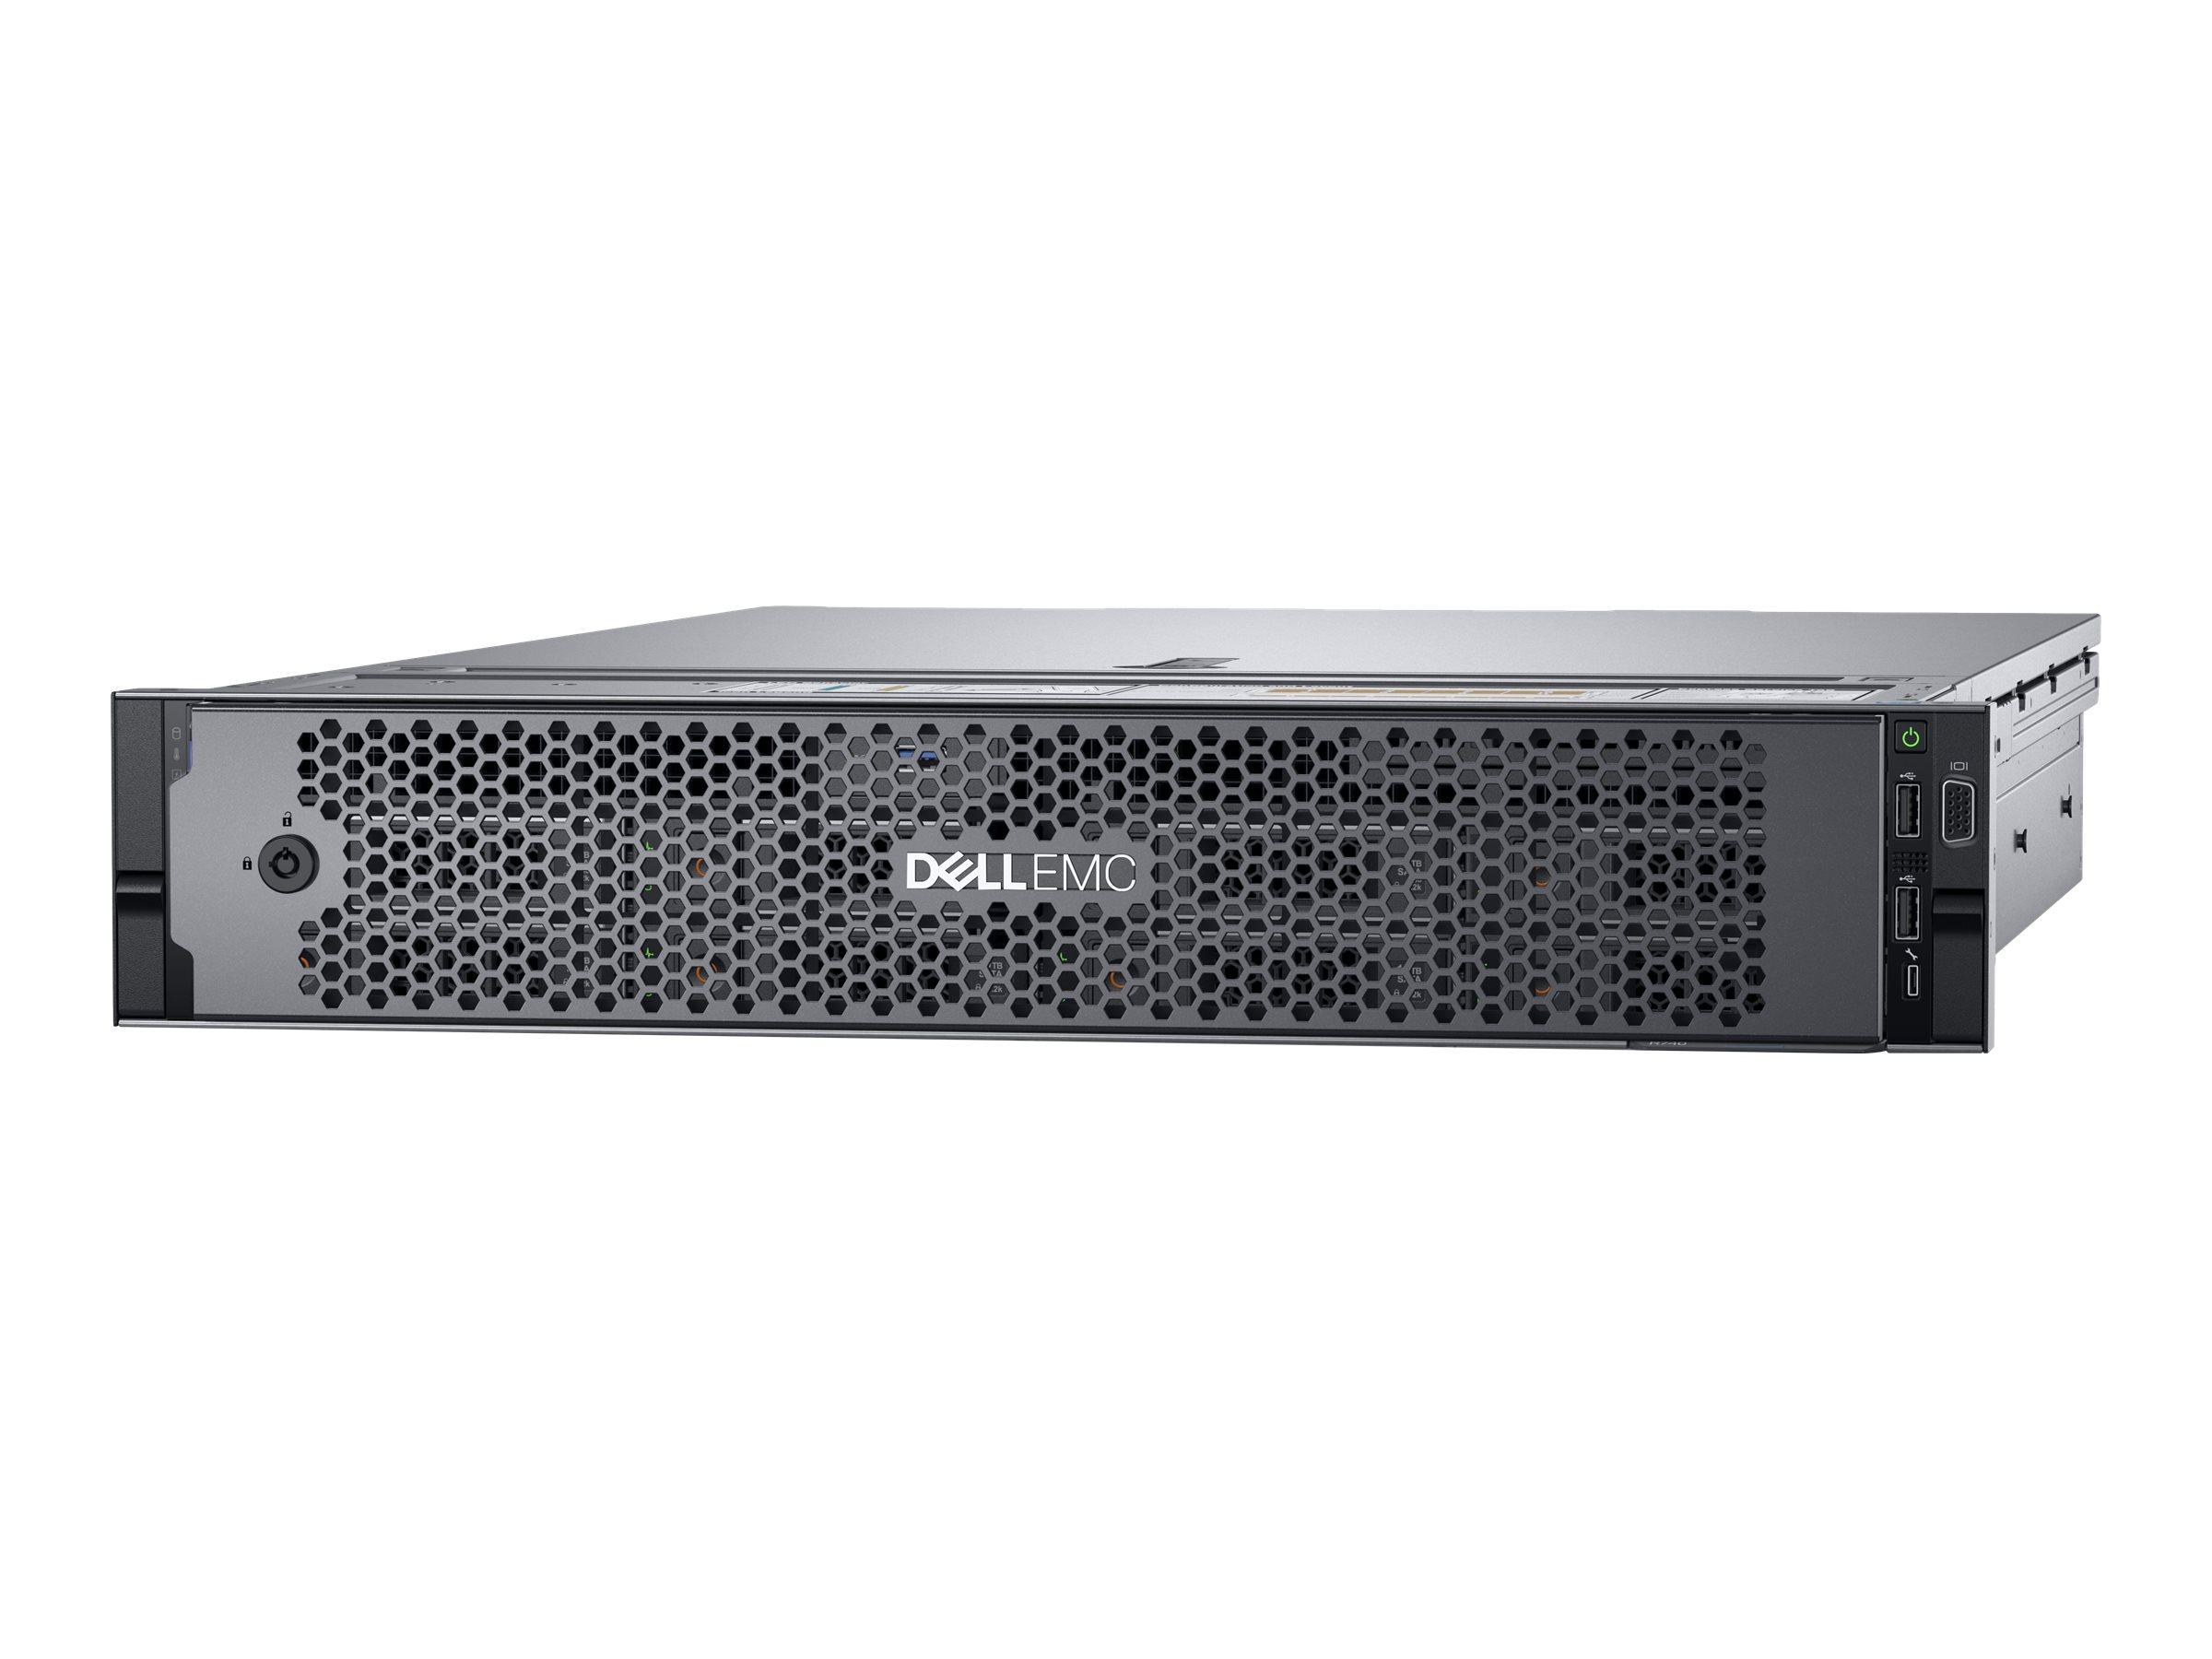 Dell EMC PowerEdge R740 - Server - Rack-Montage - 2U - zweiweg - 1 x Xeon Silver 4212 / 2.2 GHz